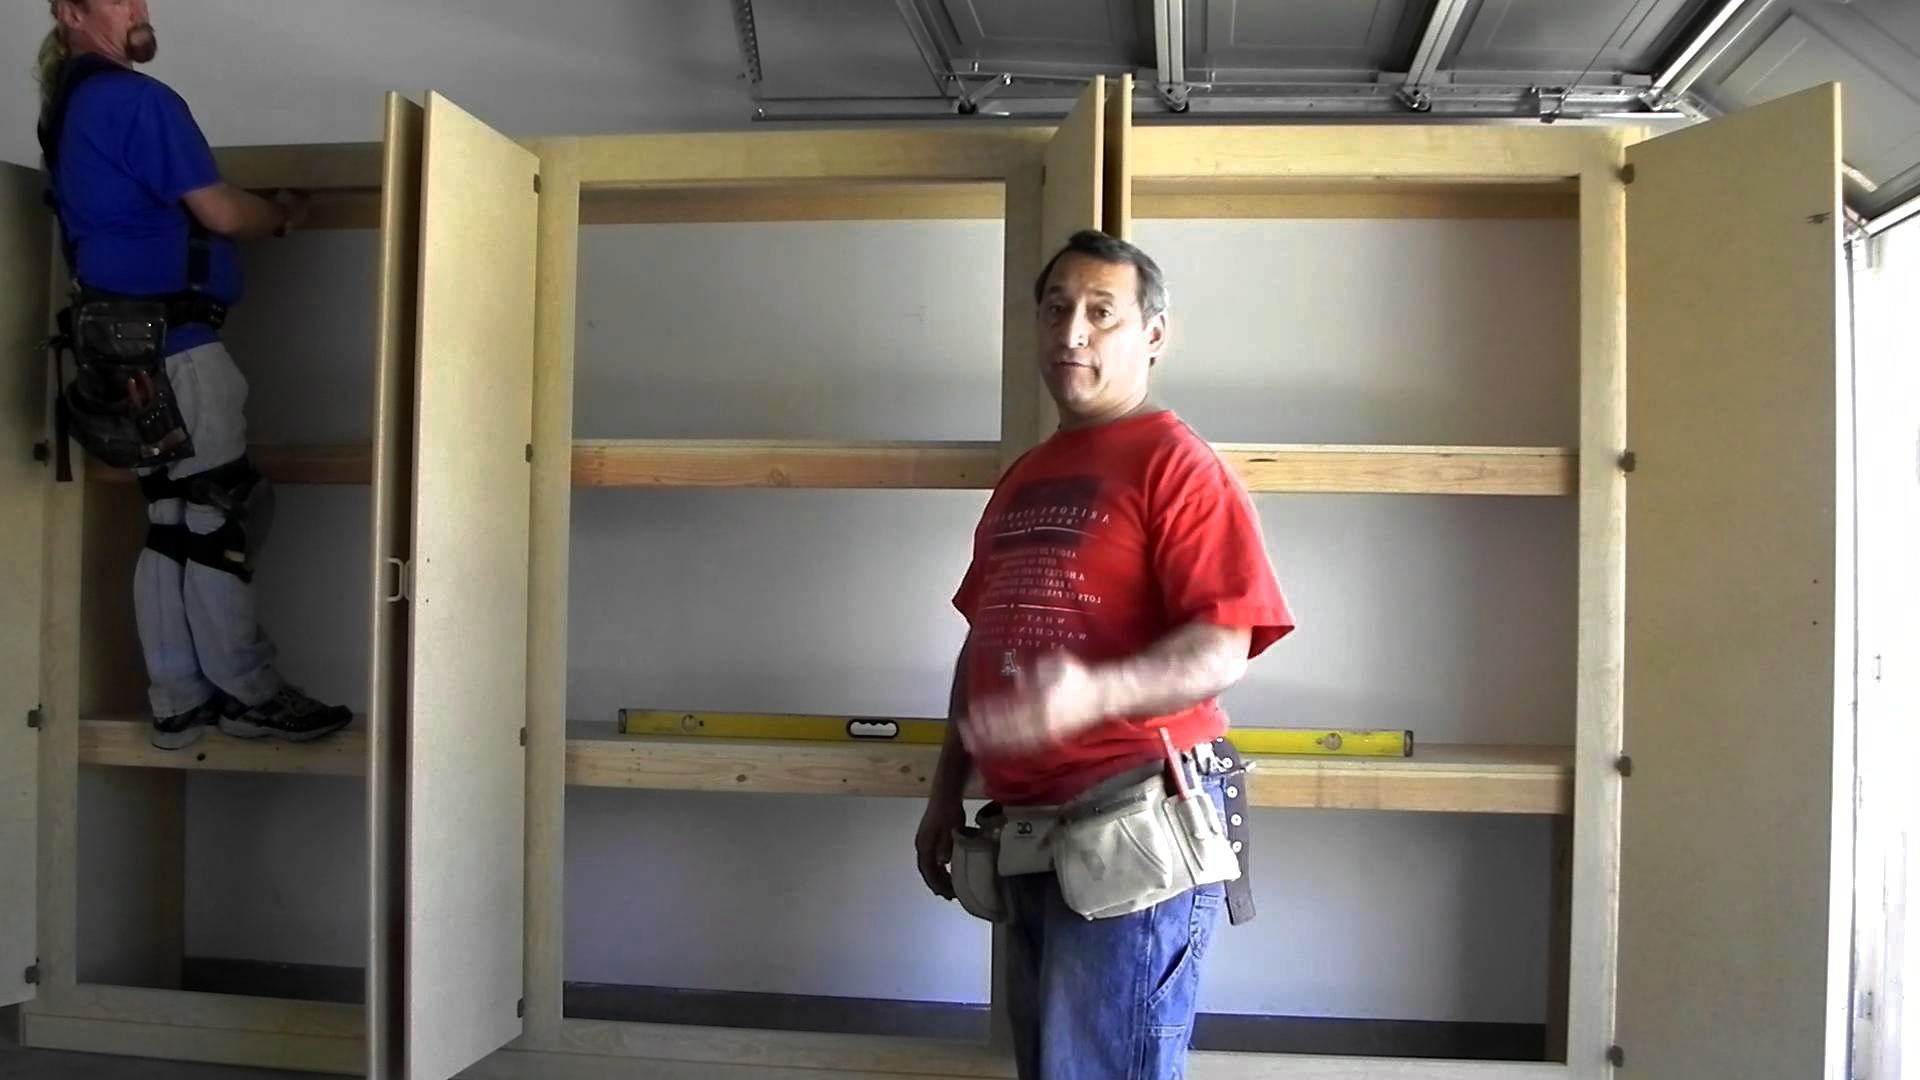 Mannyu0027s Organization Station HERCULEAN Garage Storage Cabinets.How To Build  The Strongest System. | Storage | Pinterest | Organization Station, Garage  ...